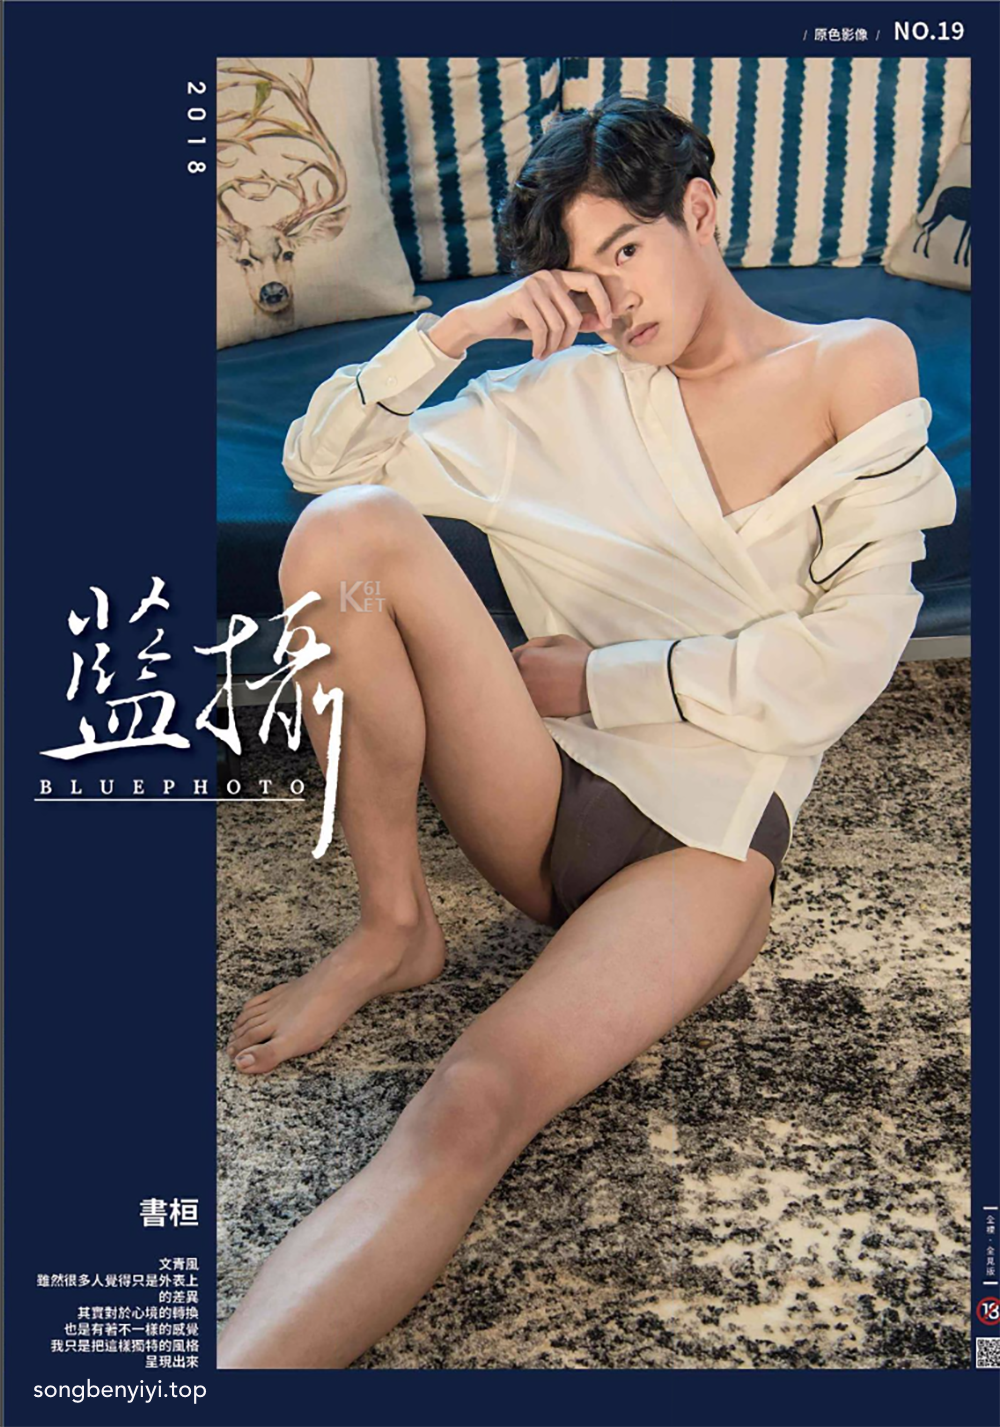 Bluephoto 藍攝 No.19-書桓 (下)-鄰家花美男-書桓-首度挑戰-全見版【ebook】01.png